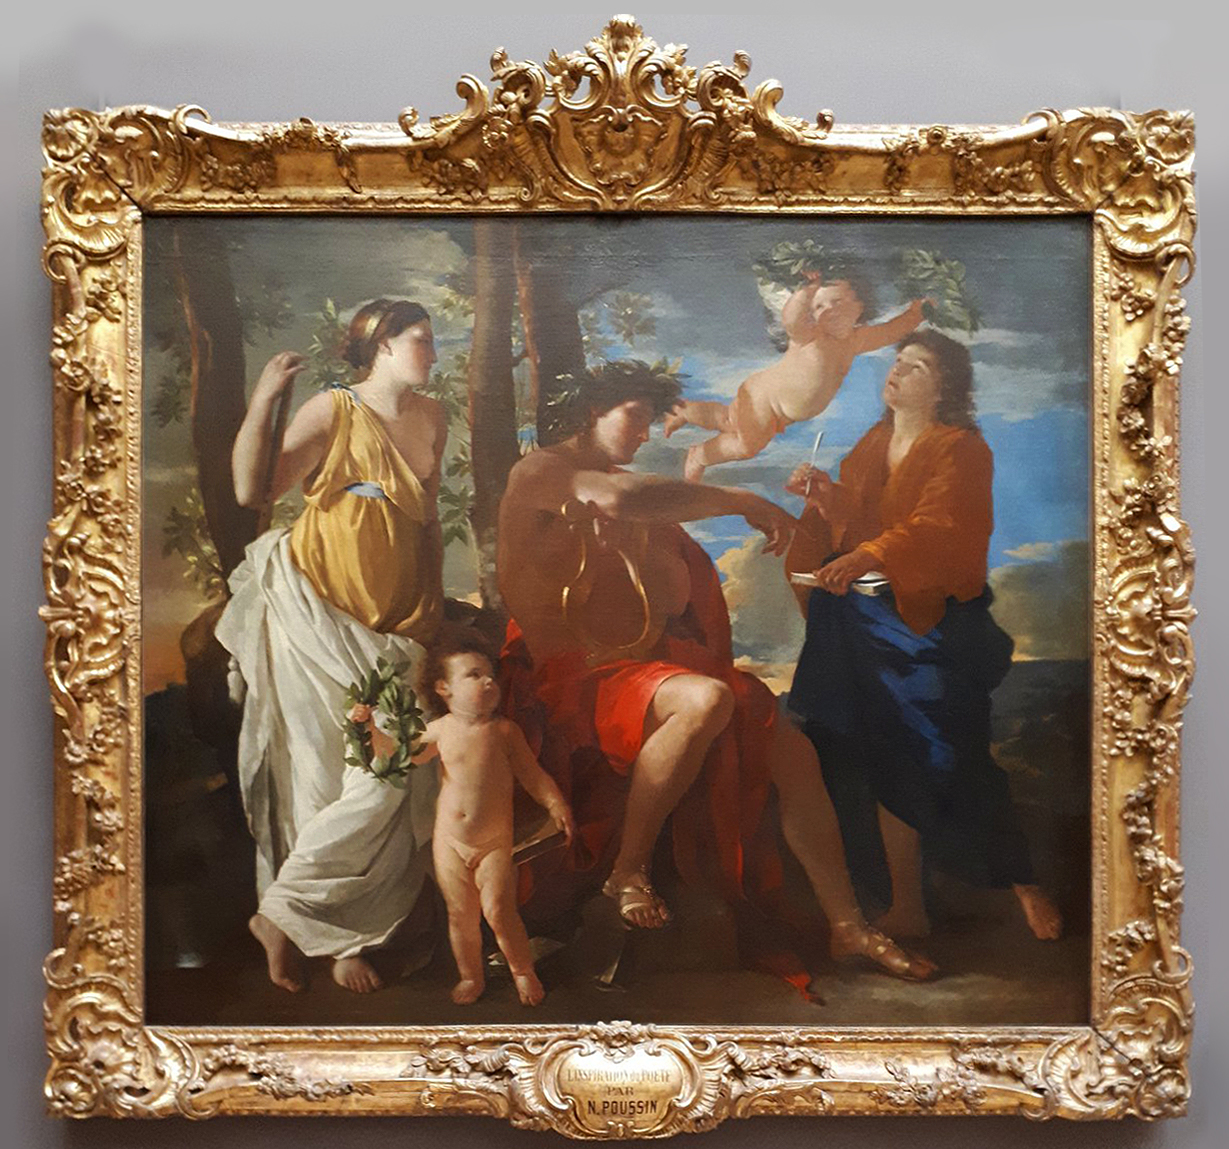 26B Poussin Inspiration of the poet Mus du Louvre